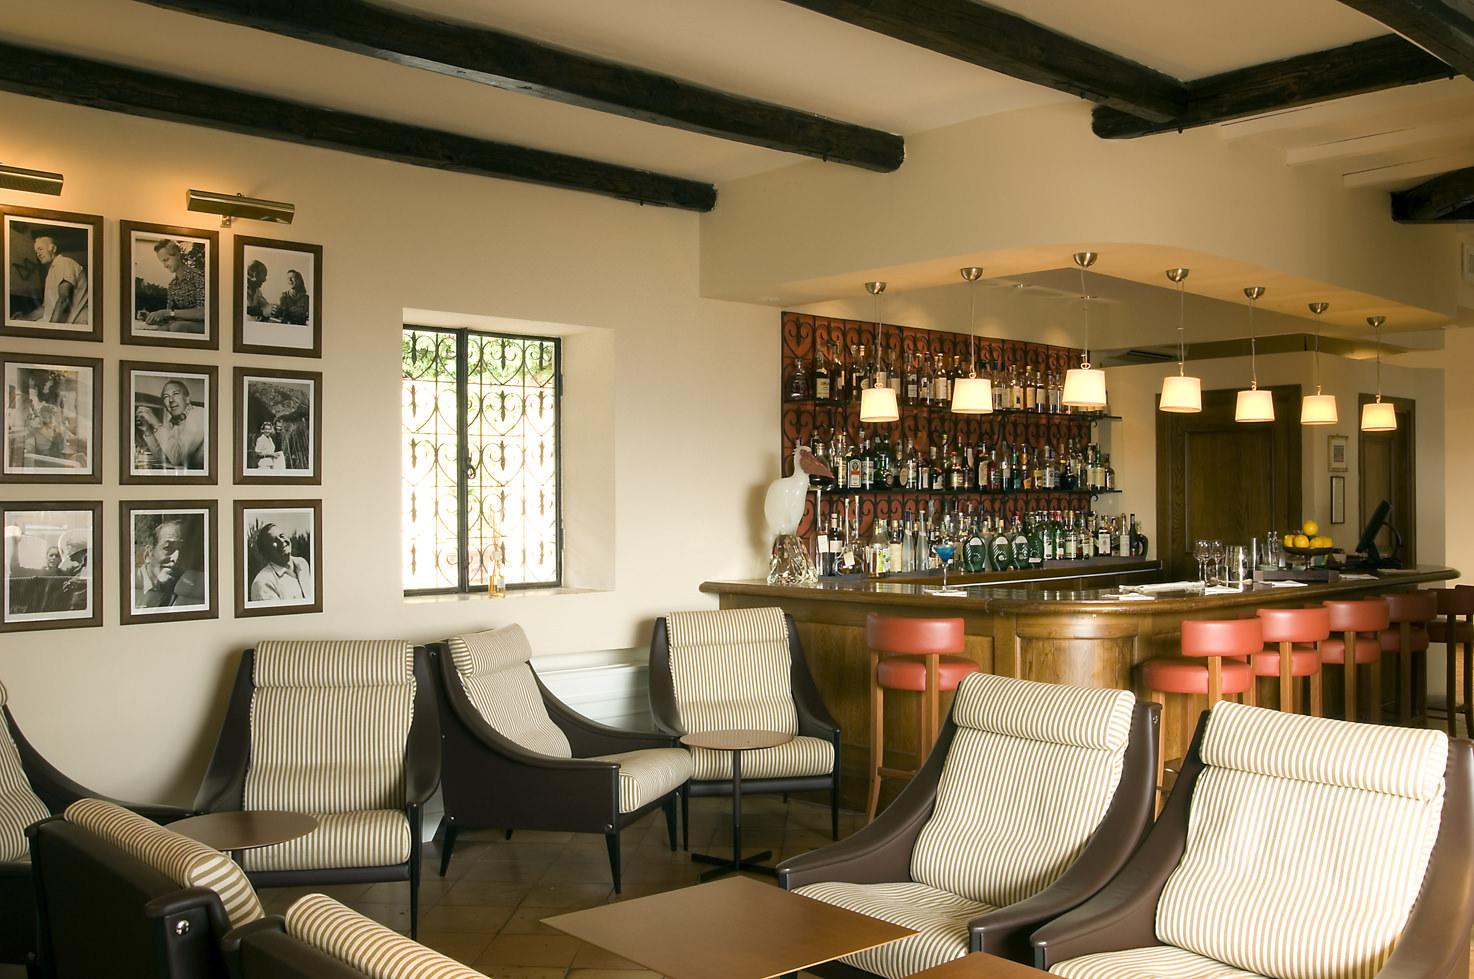 Interior of the bar